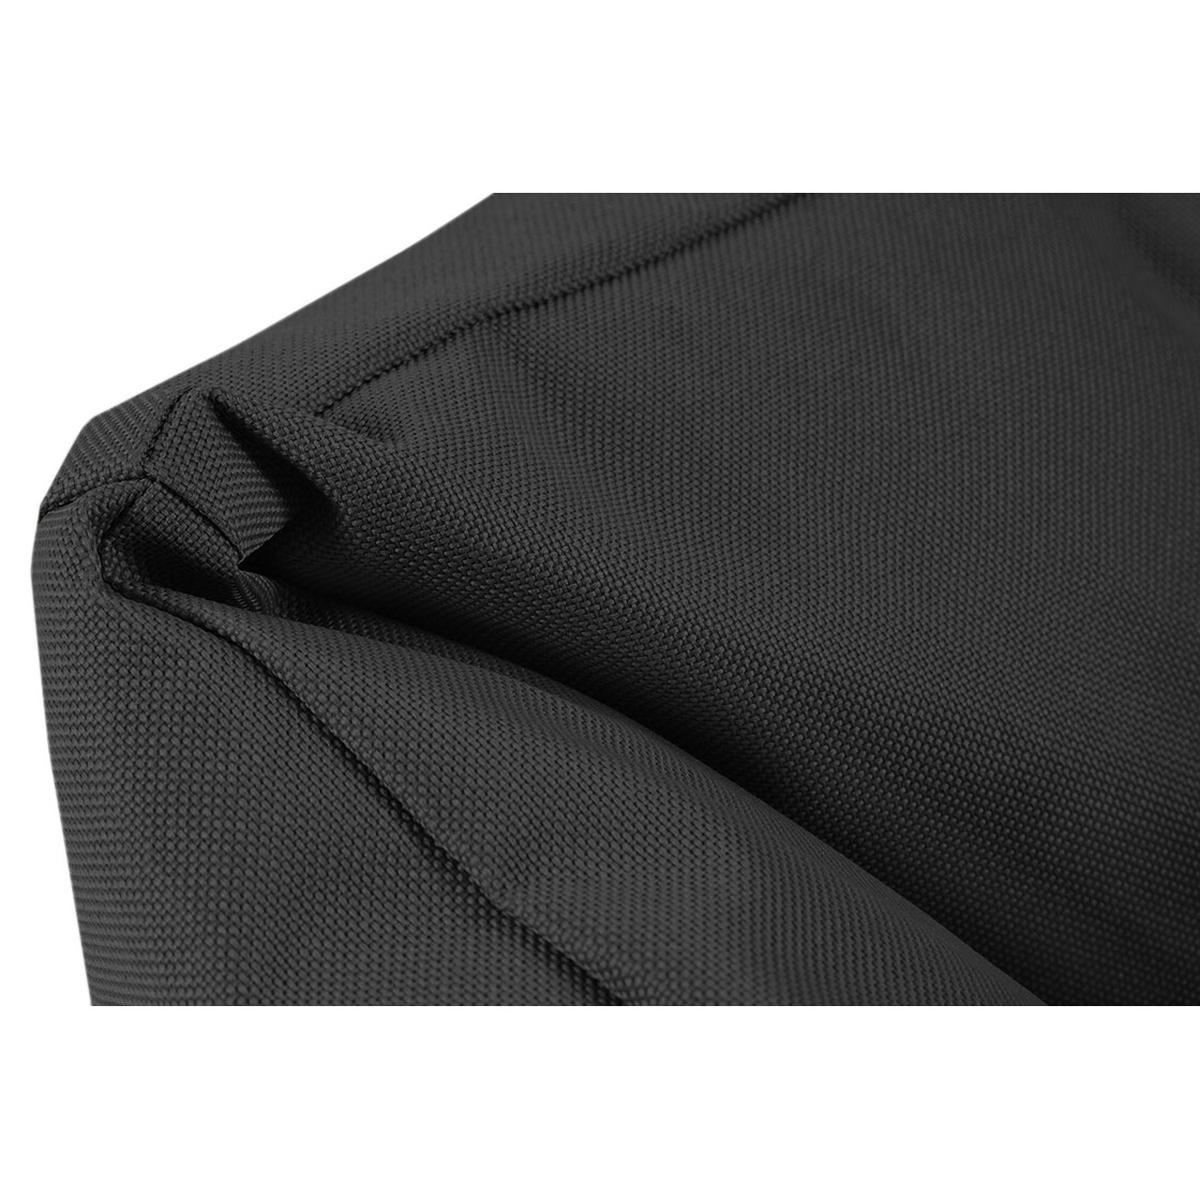 wasserfestes hundebett finlay schwarz xxl knuffelwuff. Black Bedroom Furniture Sets. Home Design Ideas